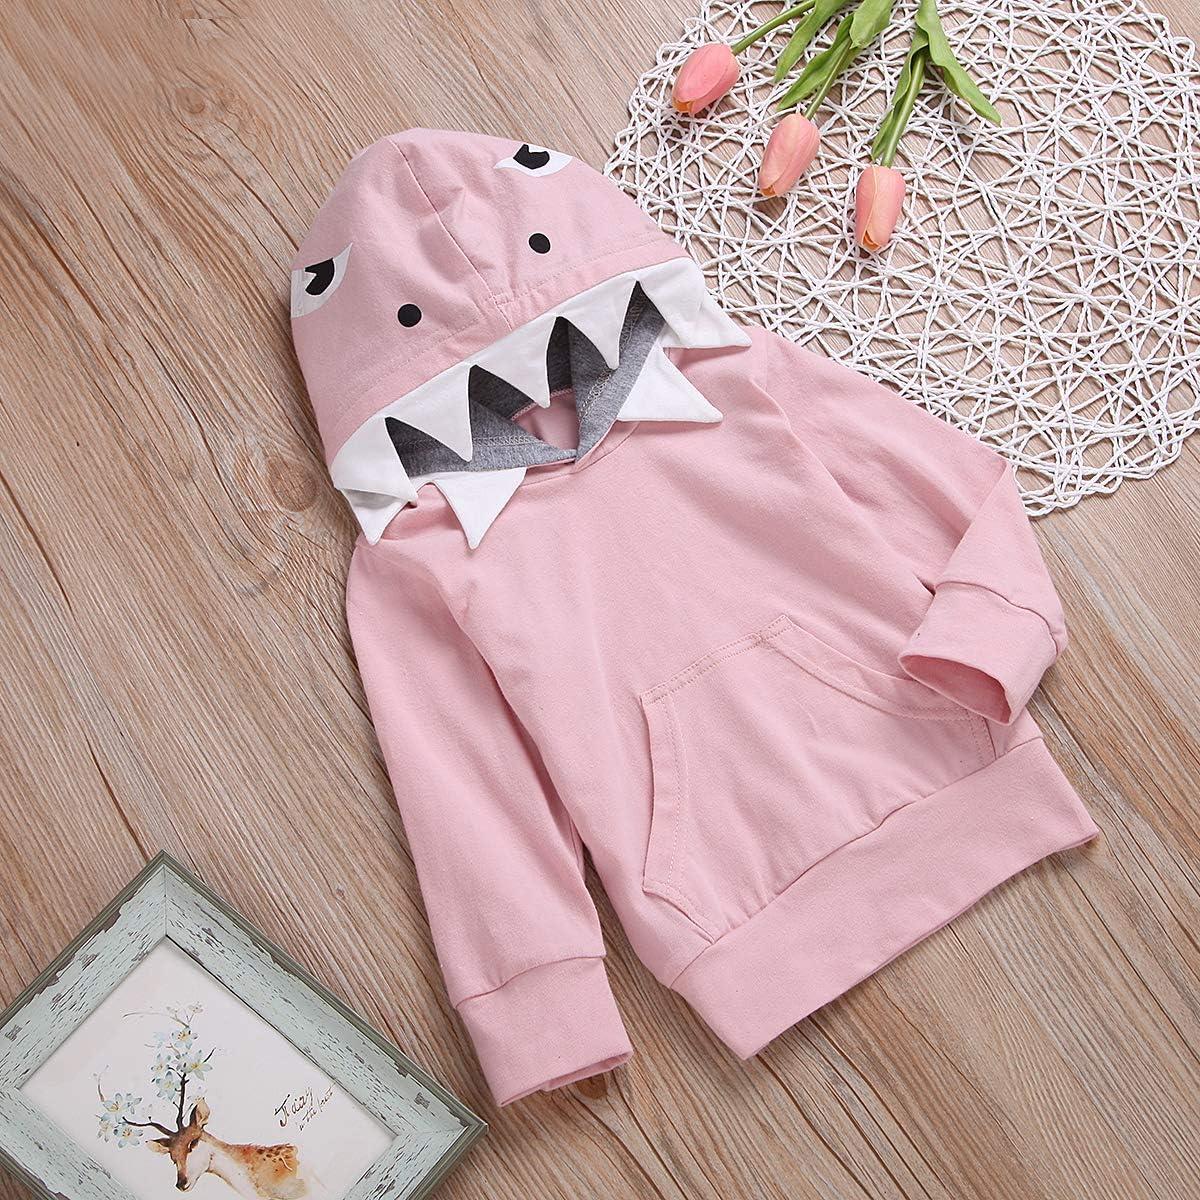 Unisex Baby Autumn Winter Shark Hooded Sweatshirt Boys Girls Hoodies with Kangaroo Muff Pockets /& Shark Fin